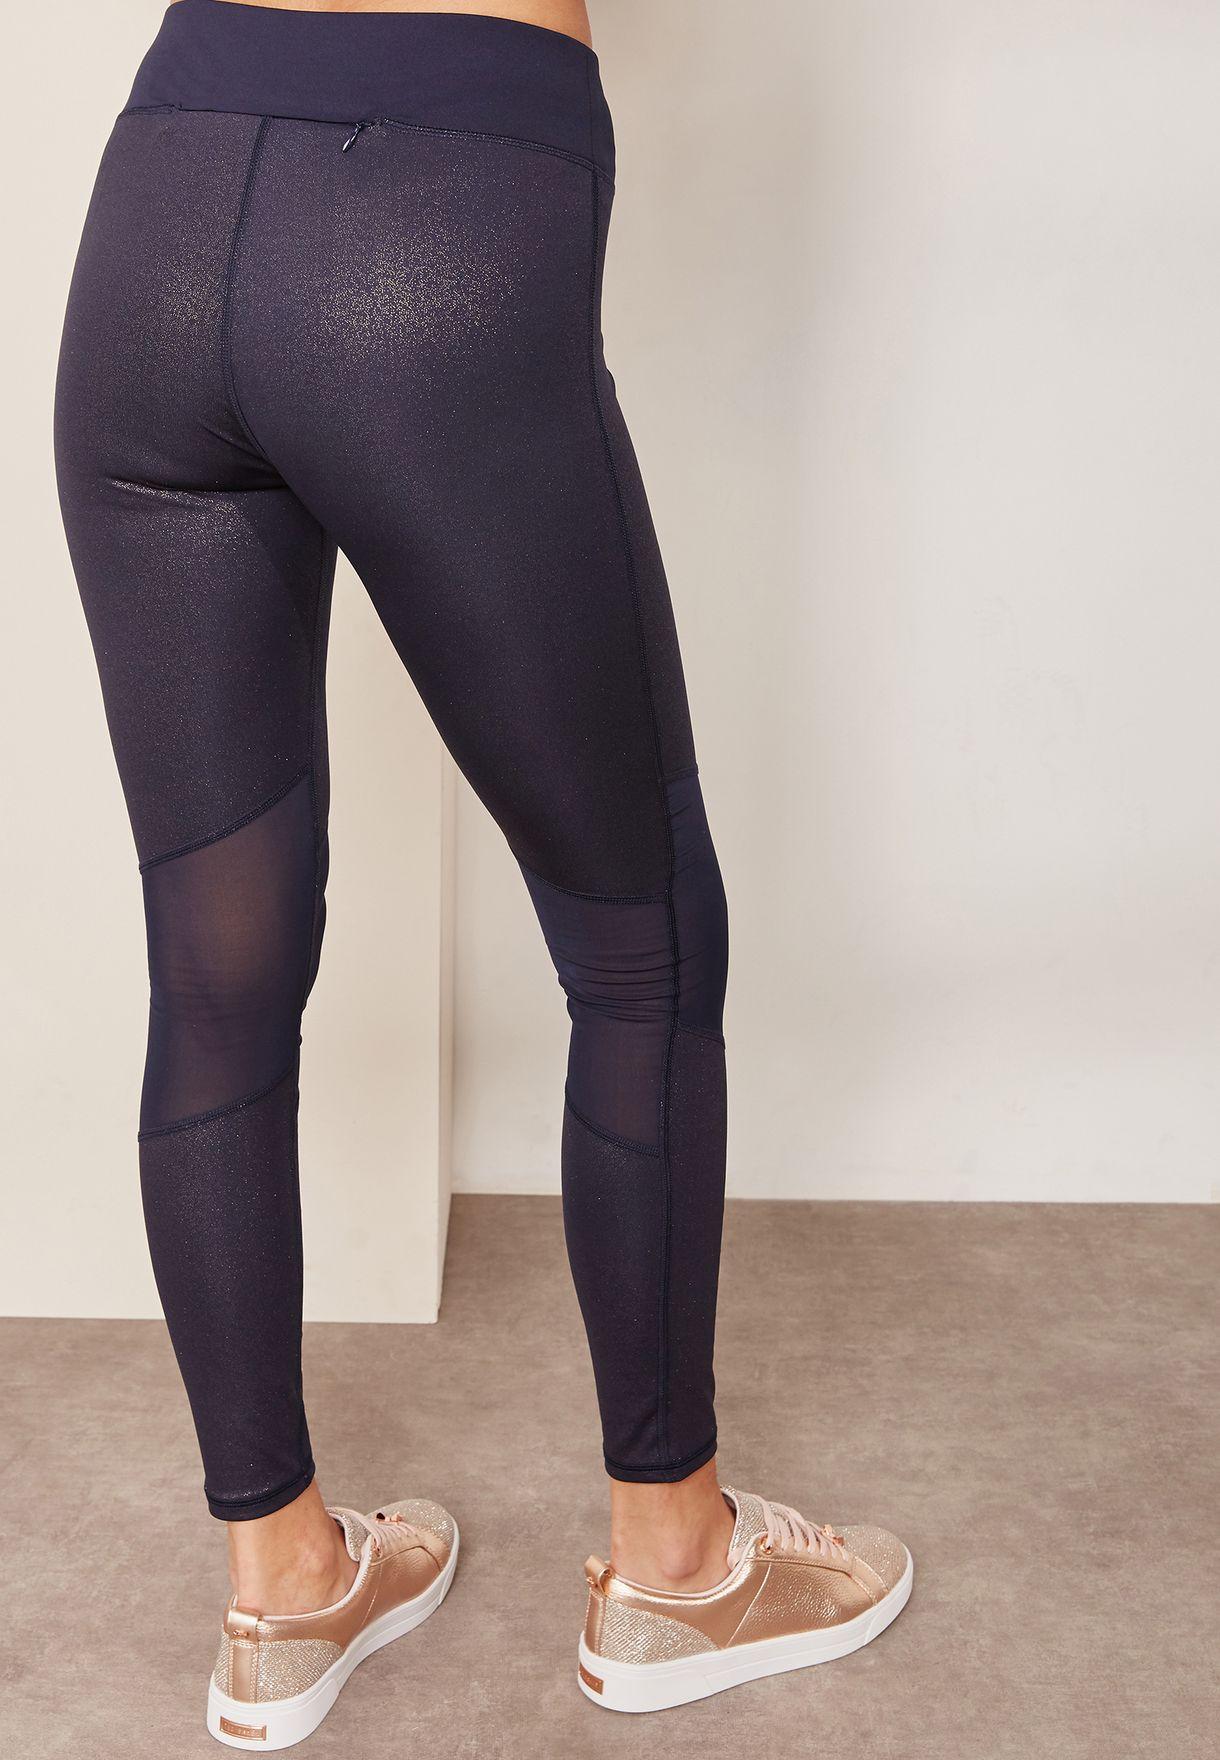 8cc230f69 Shop Ted baker multicolor Metallic Mesh Leggings 144548 for Women in ...